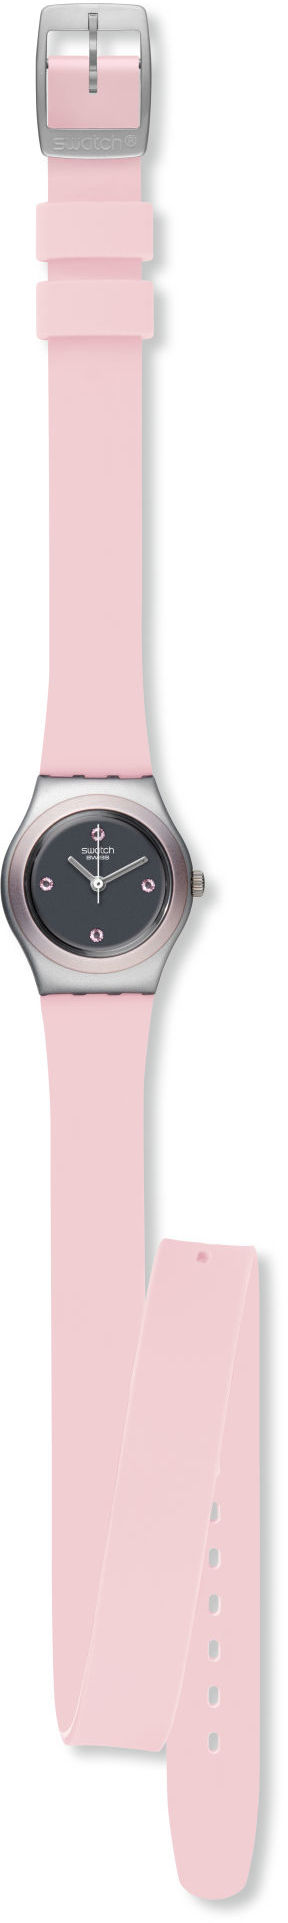 Swatch YSS1009